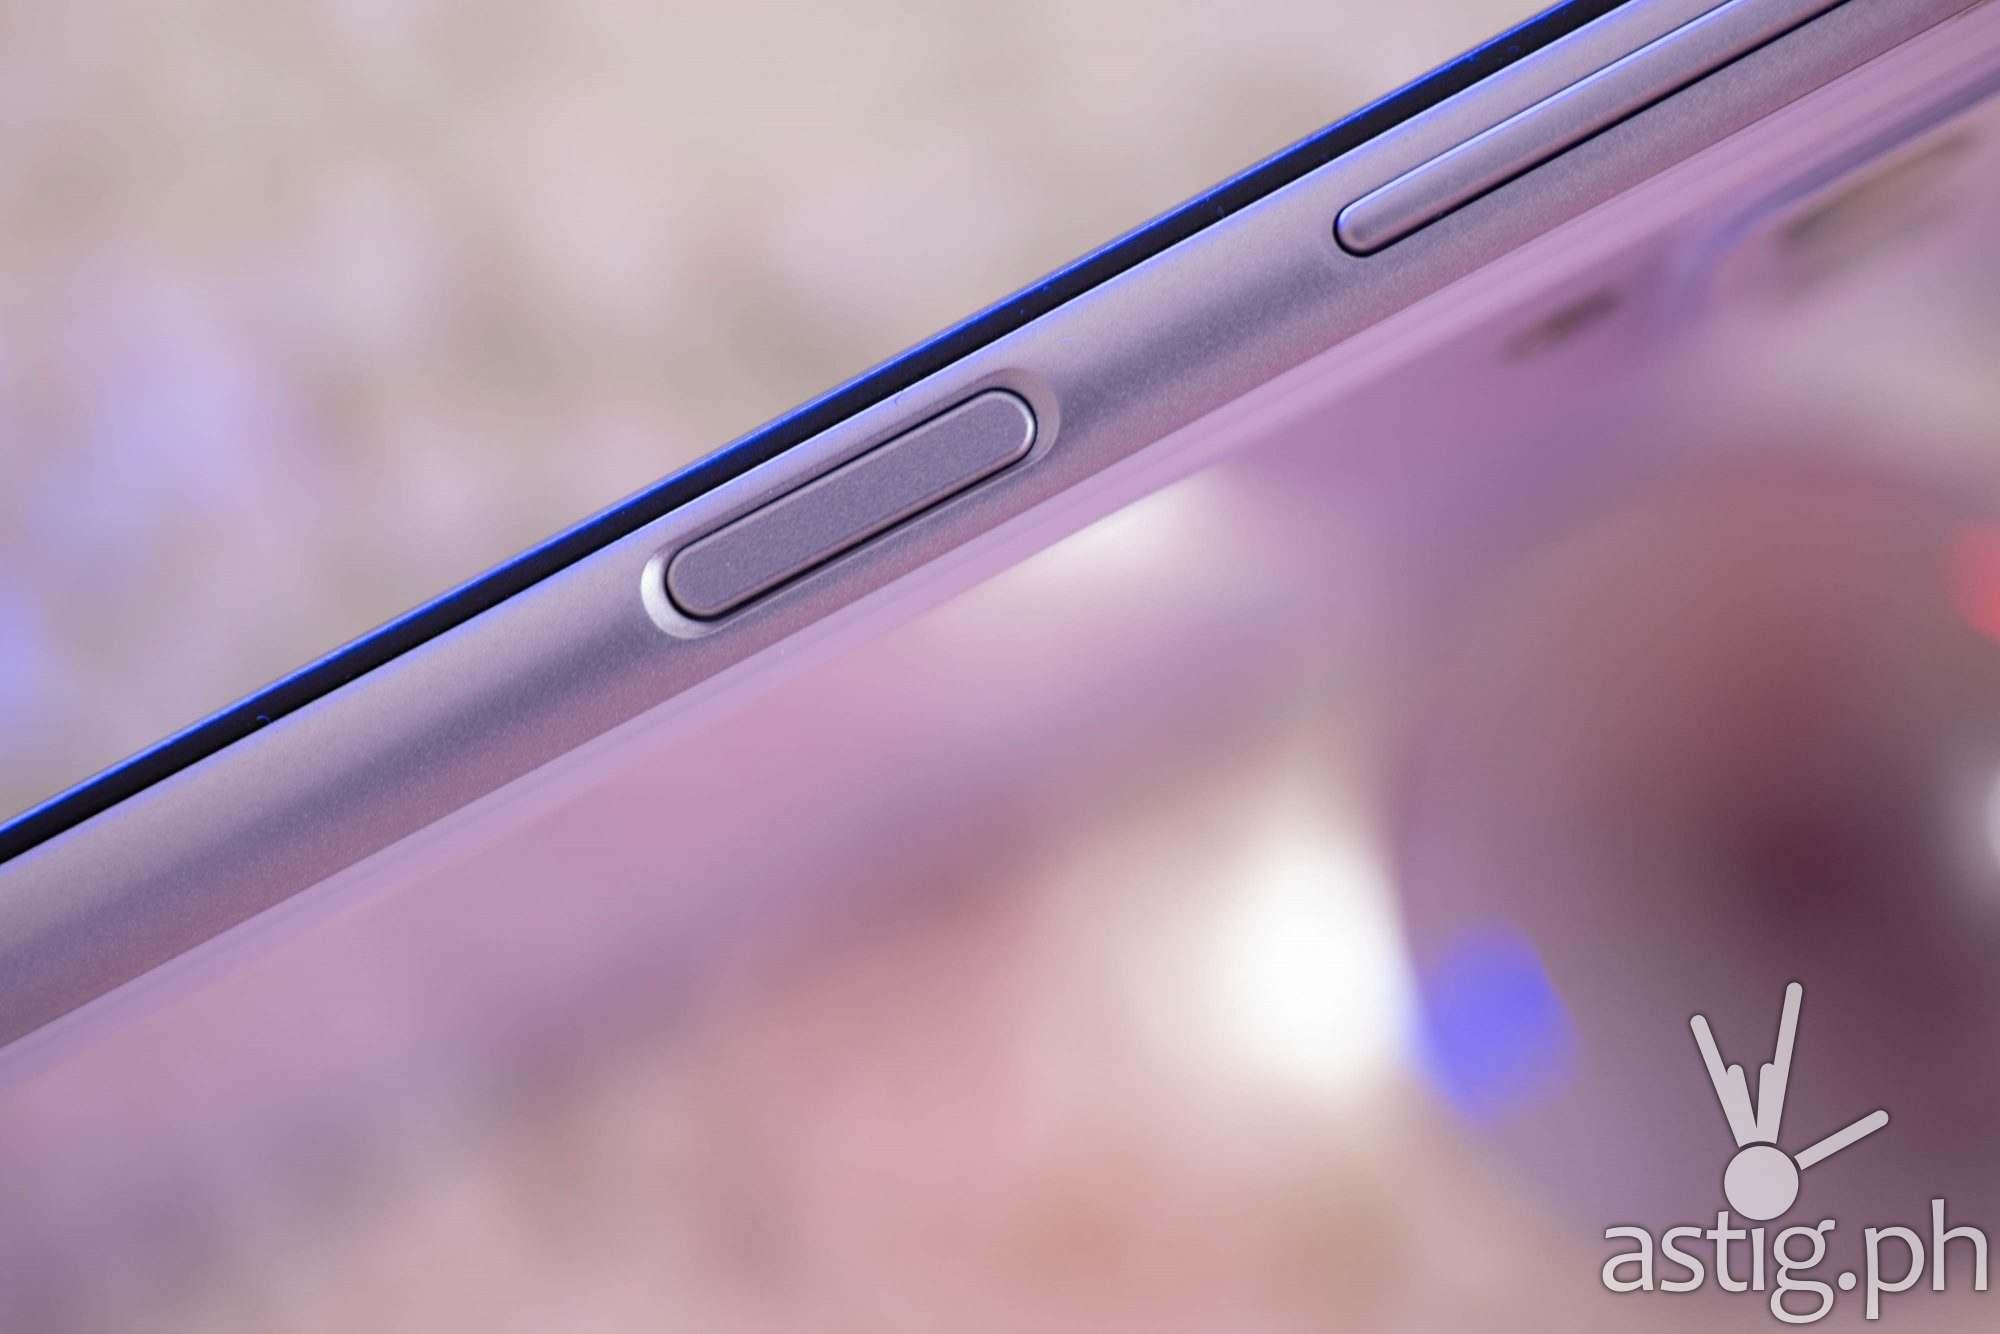 Power button with fingerprint scanner - Samsung Galaxy A22 (Philippines)